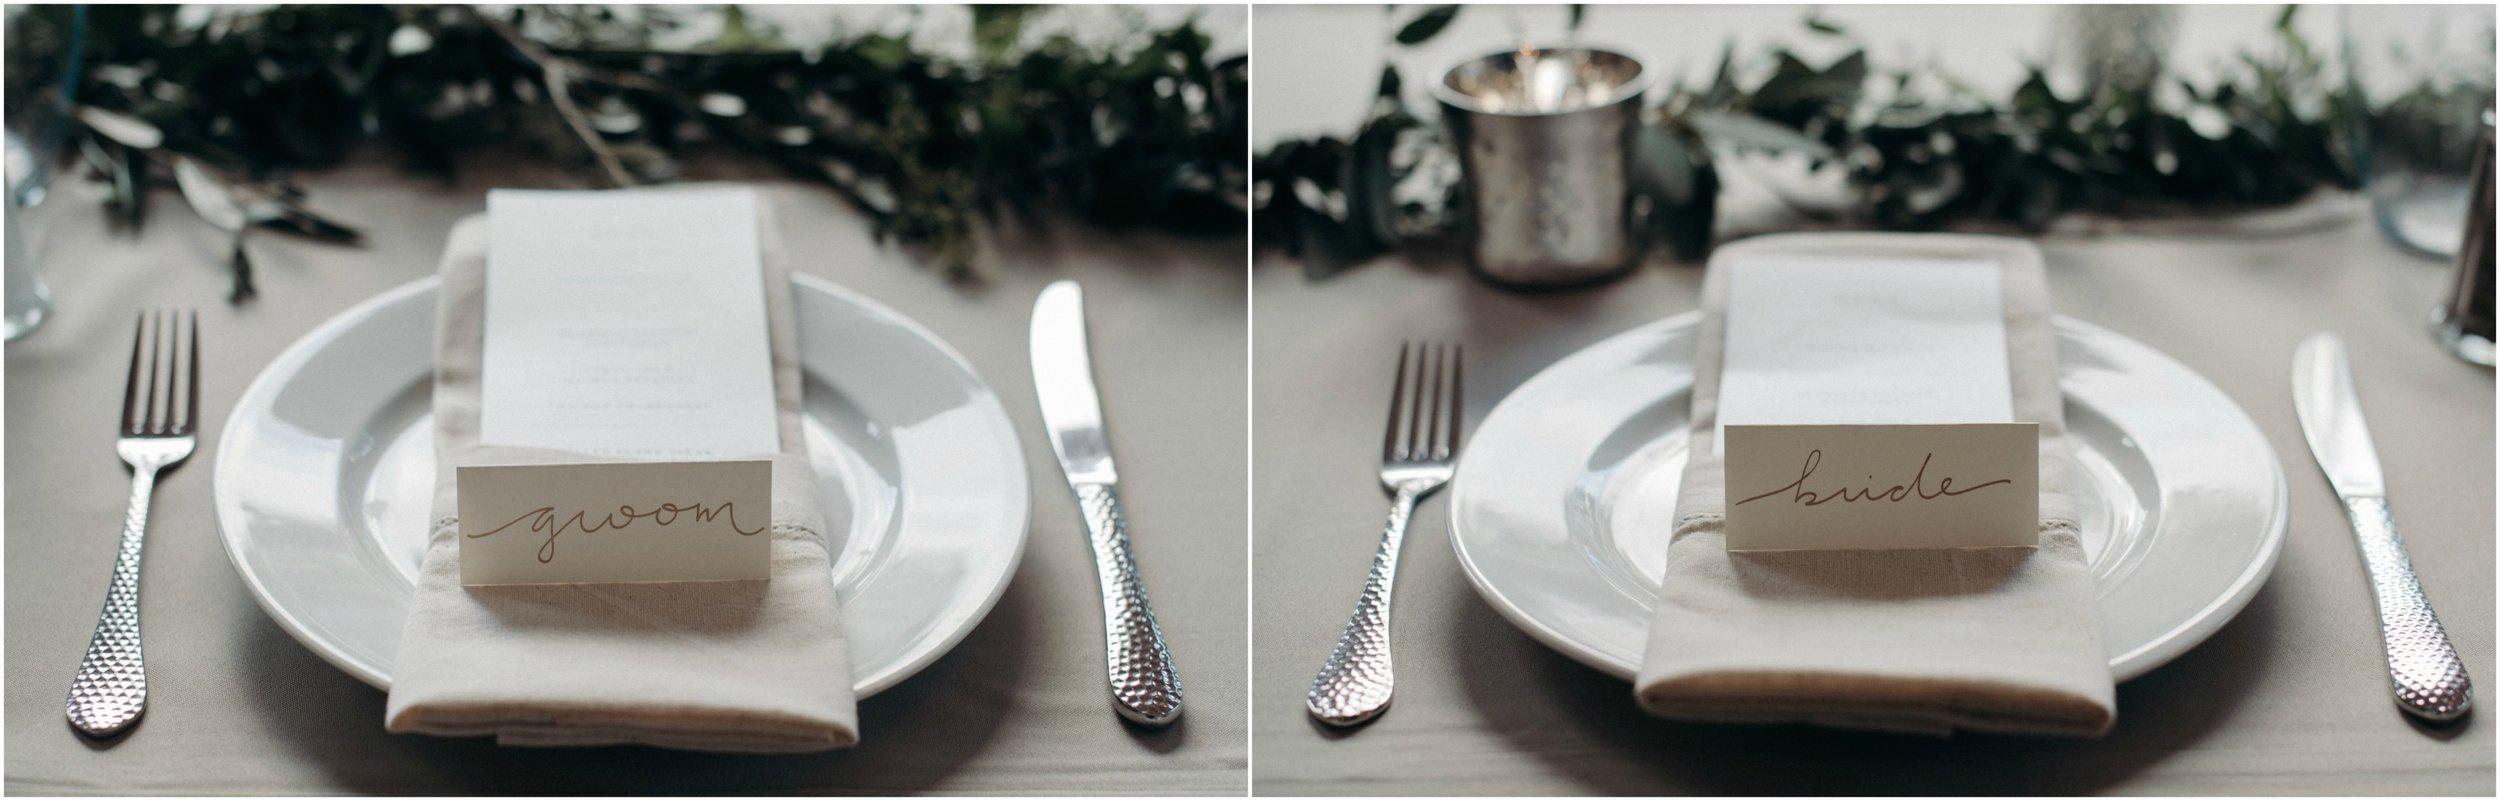 randy-sarah-casa-feliz-bride-groom-plates.jpg